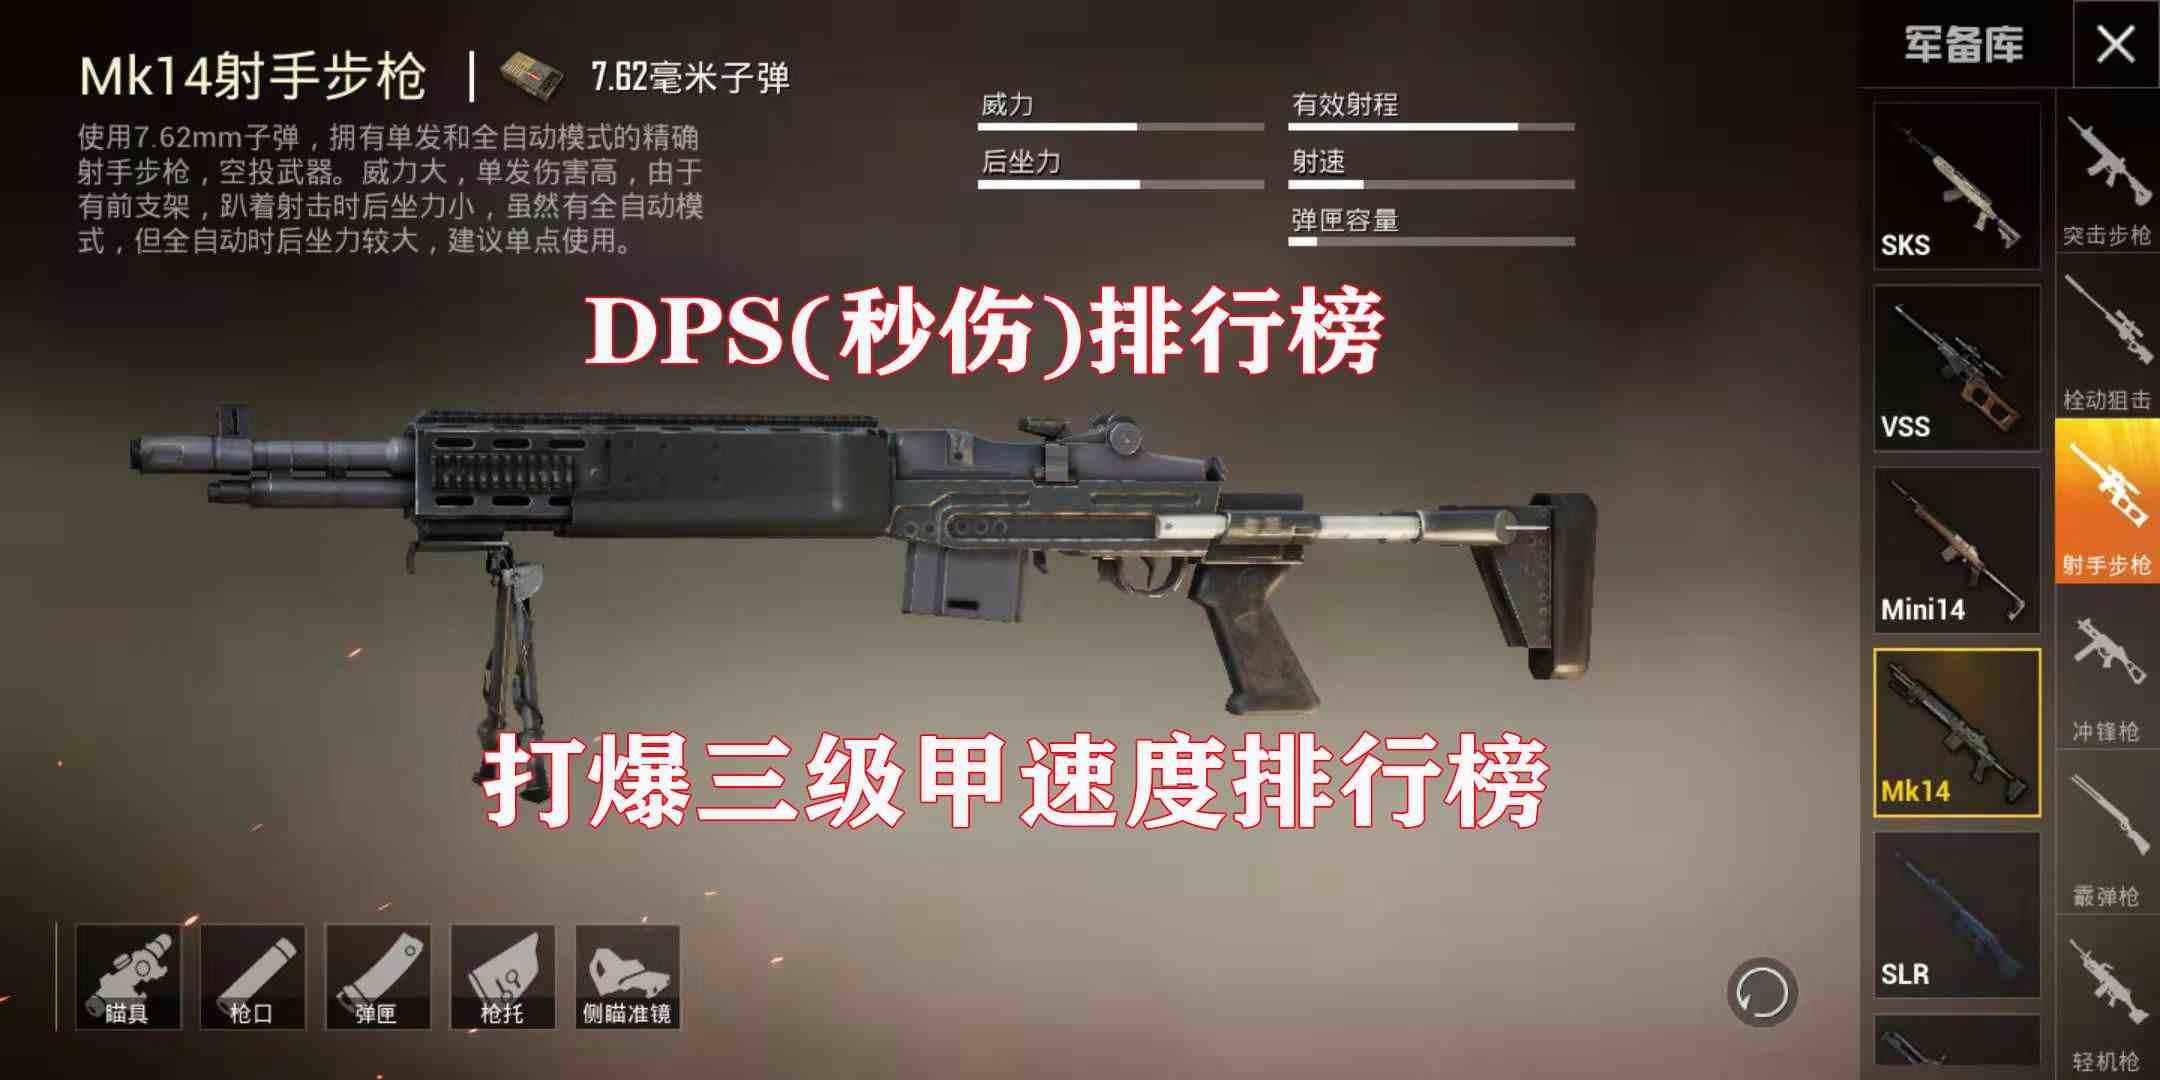 dps是什么意思(DPS、射速、稳定10大枪械排行榜)